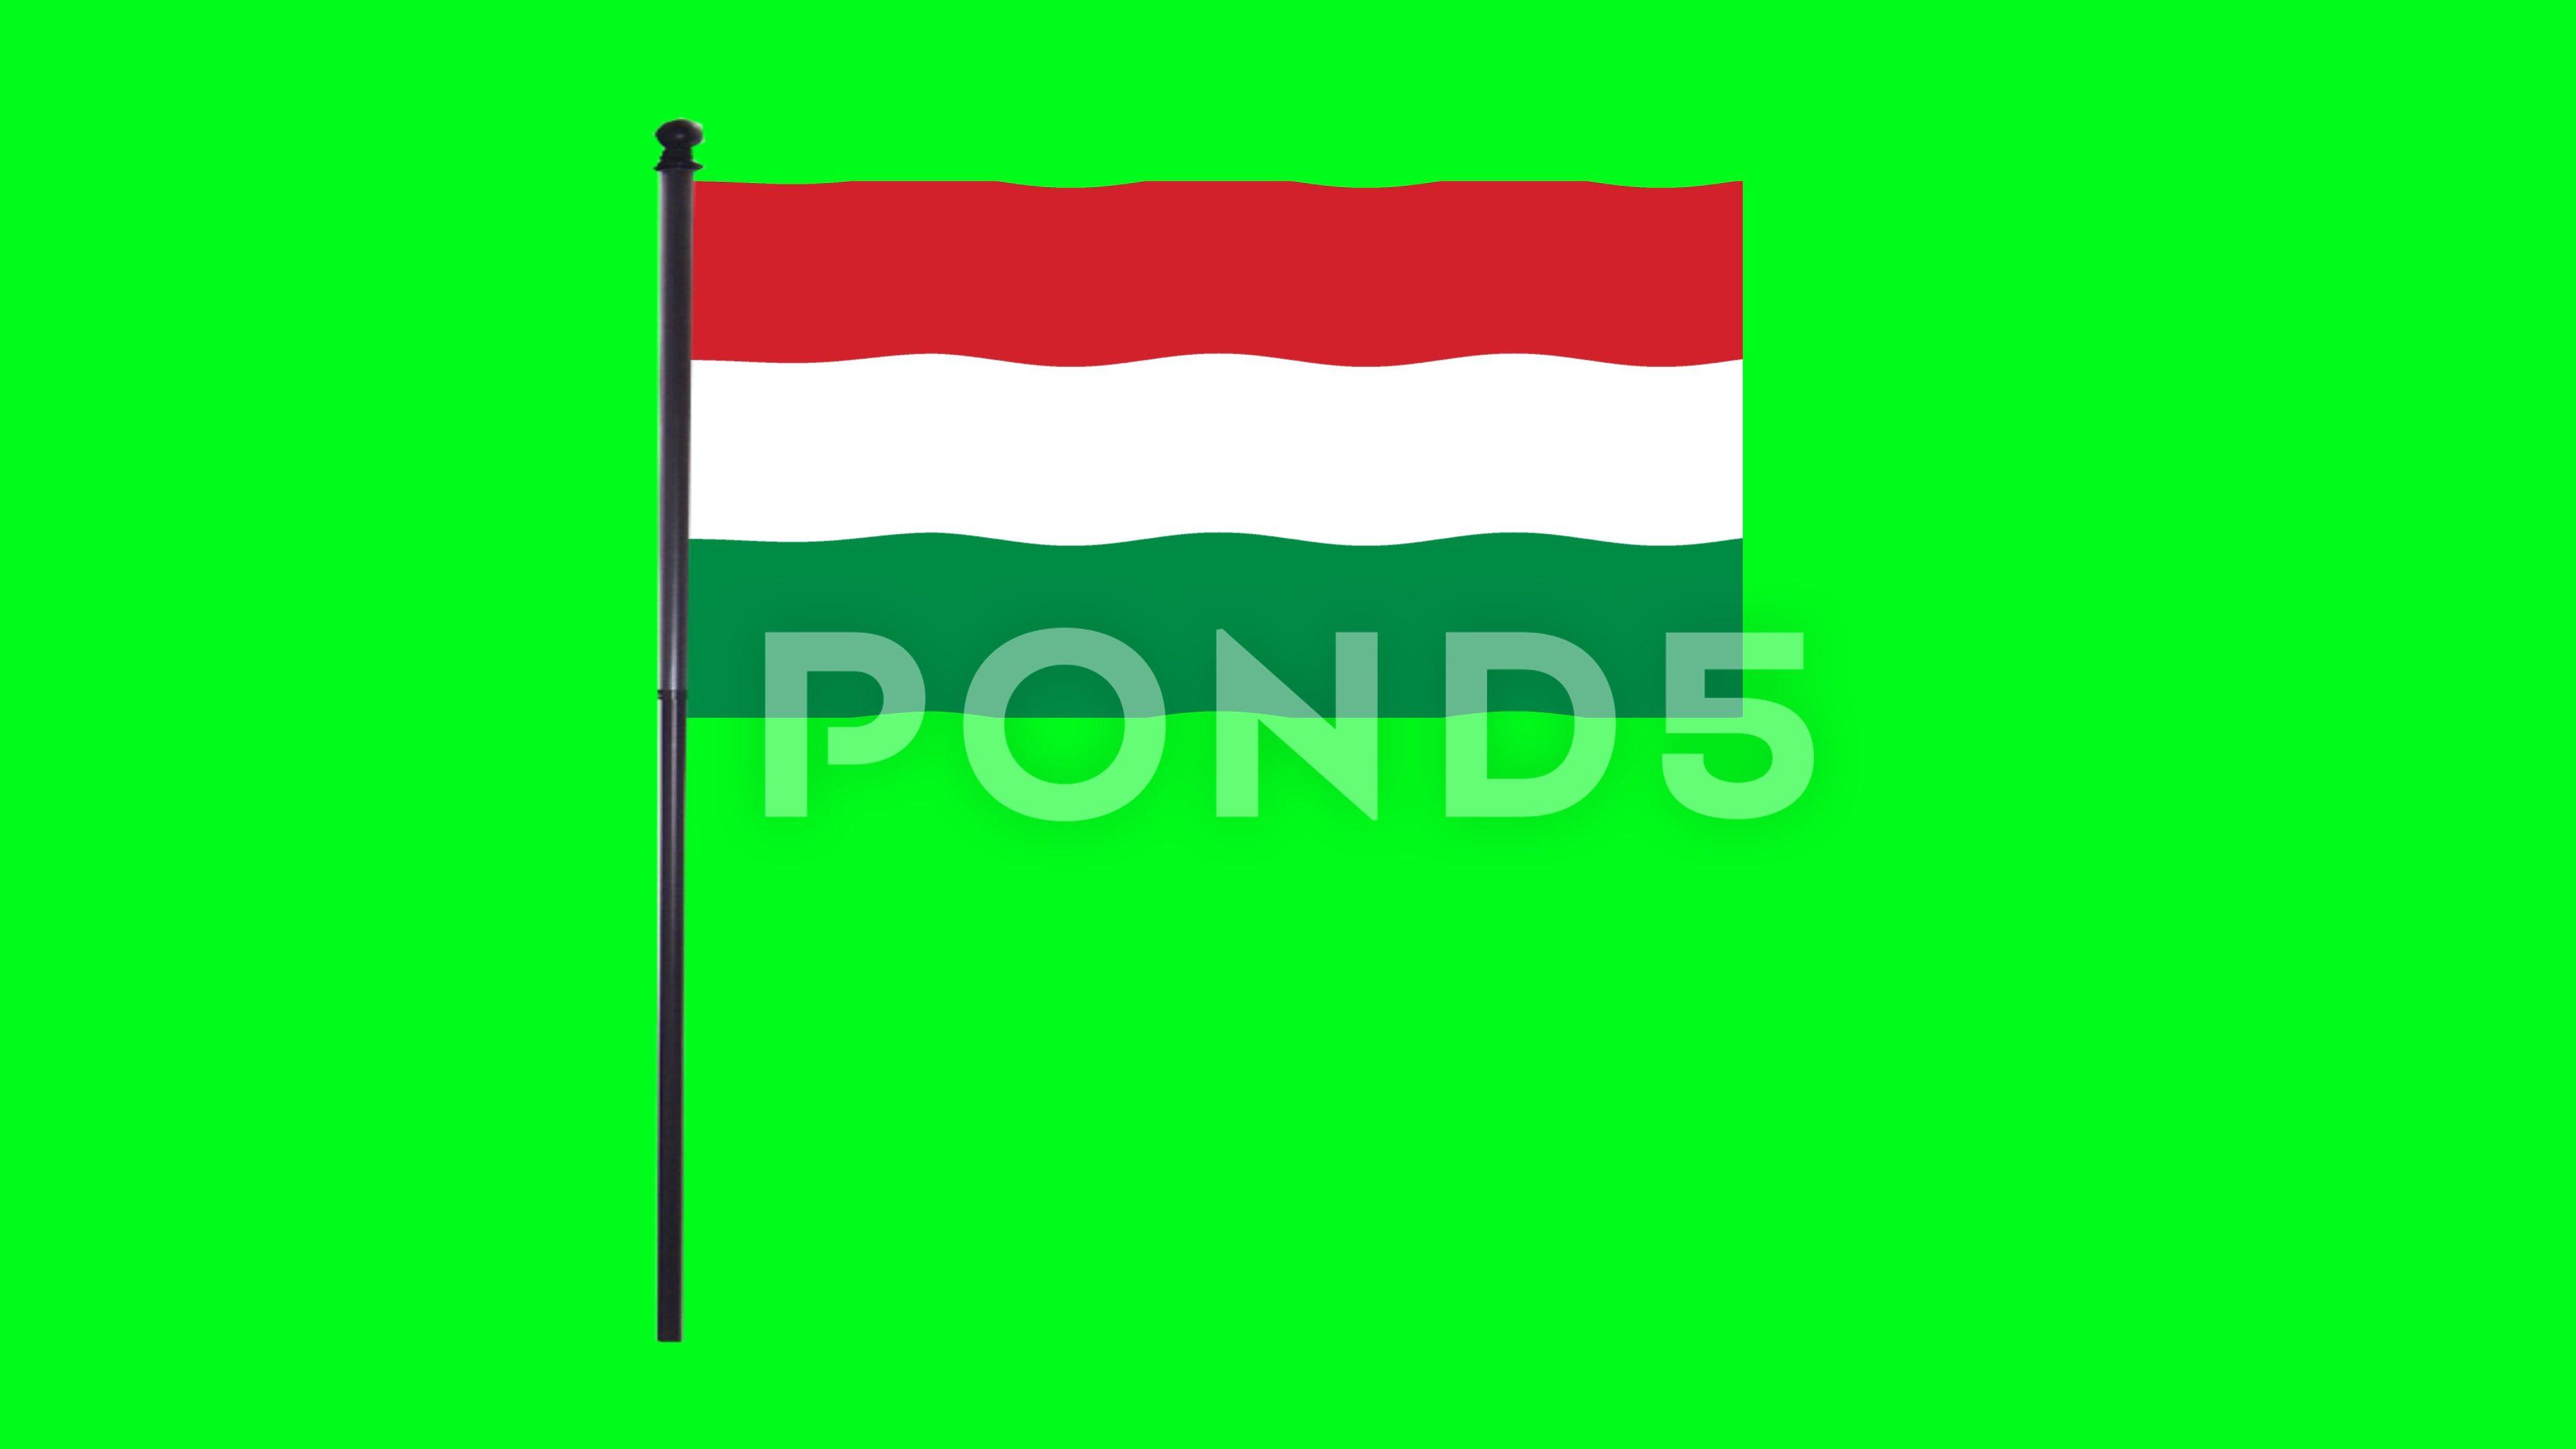 4k Hungary Flag Is Waving In Green Screen Stock Footage Ad Waving Flag Hungary Green Hungary Flag Greenscreen Waves